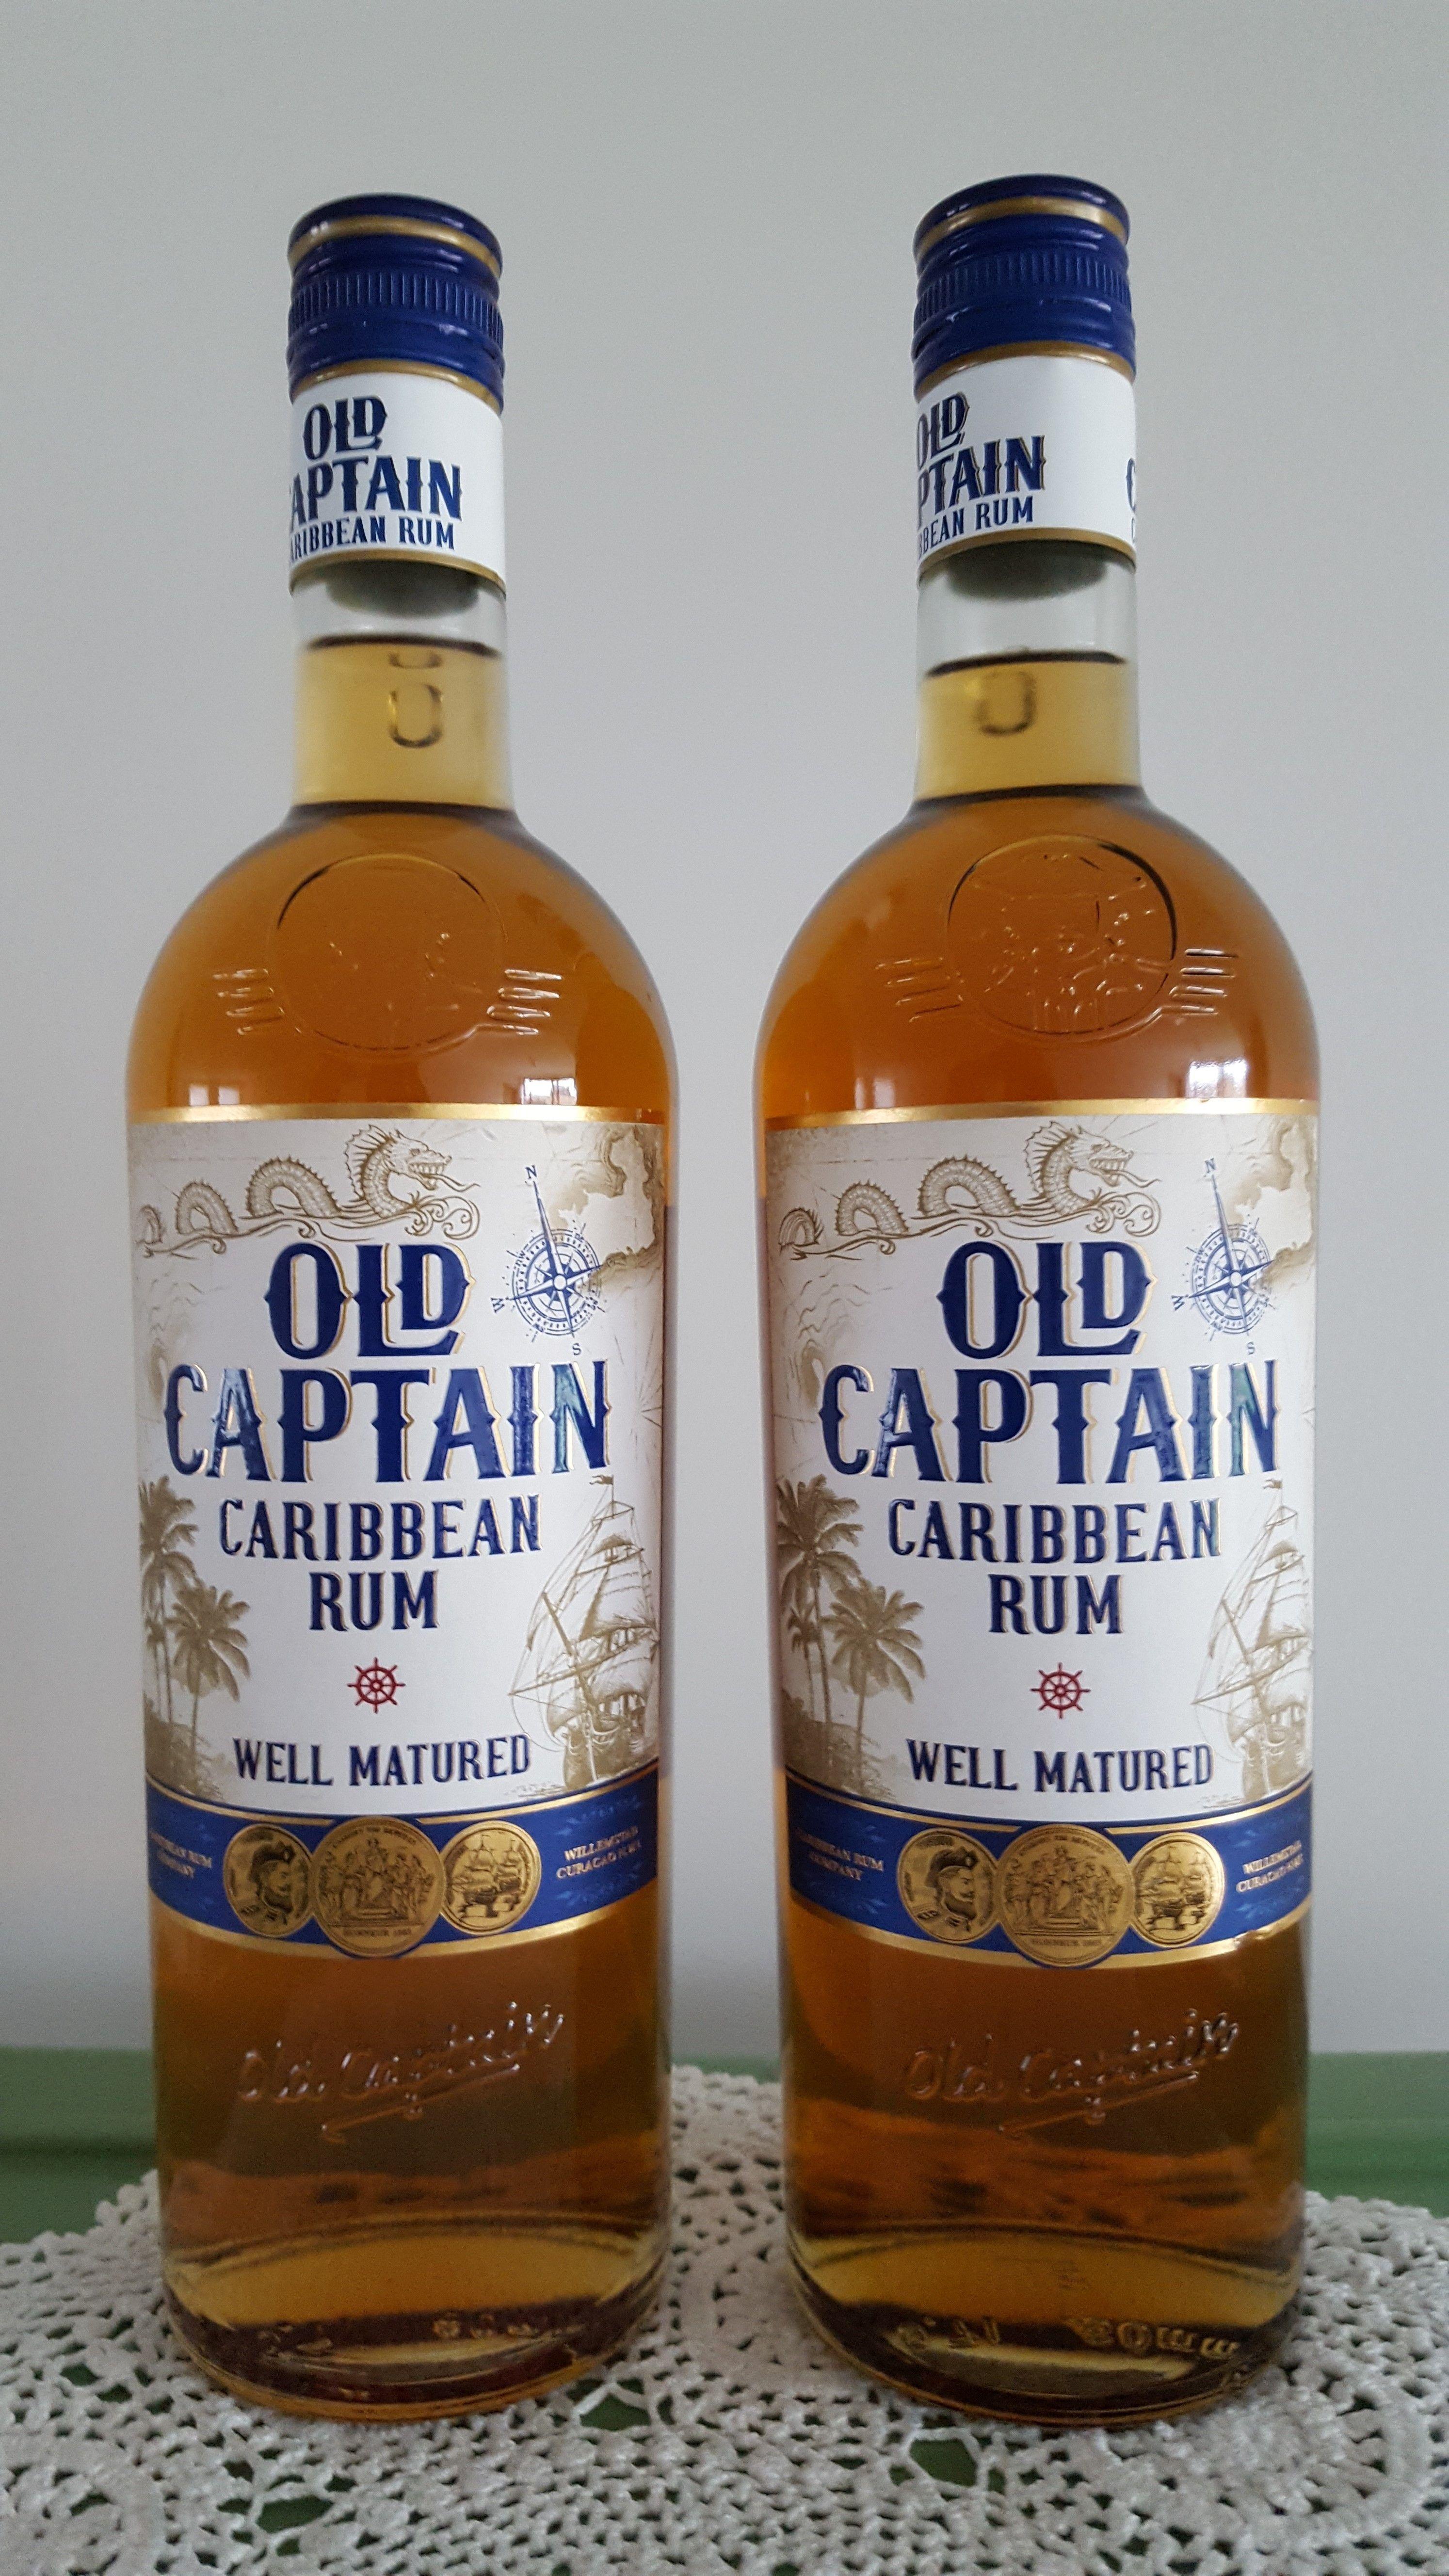 Fresh Picture Of Bacardi Rum Bottle Rum bottle, Bacardi